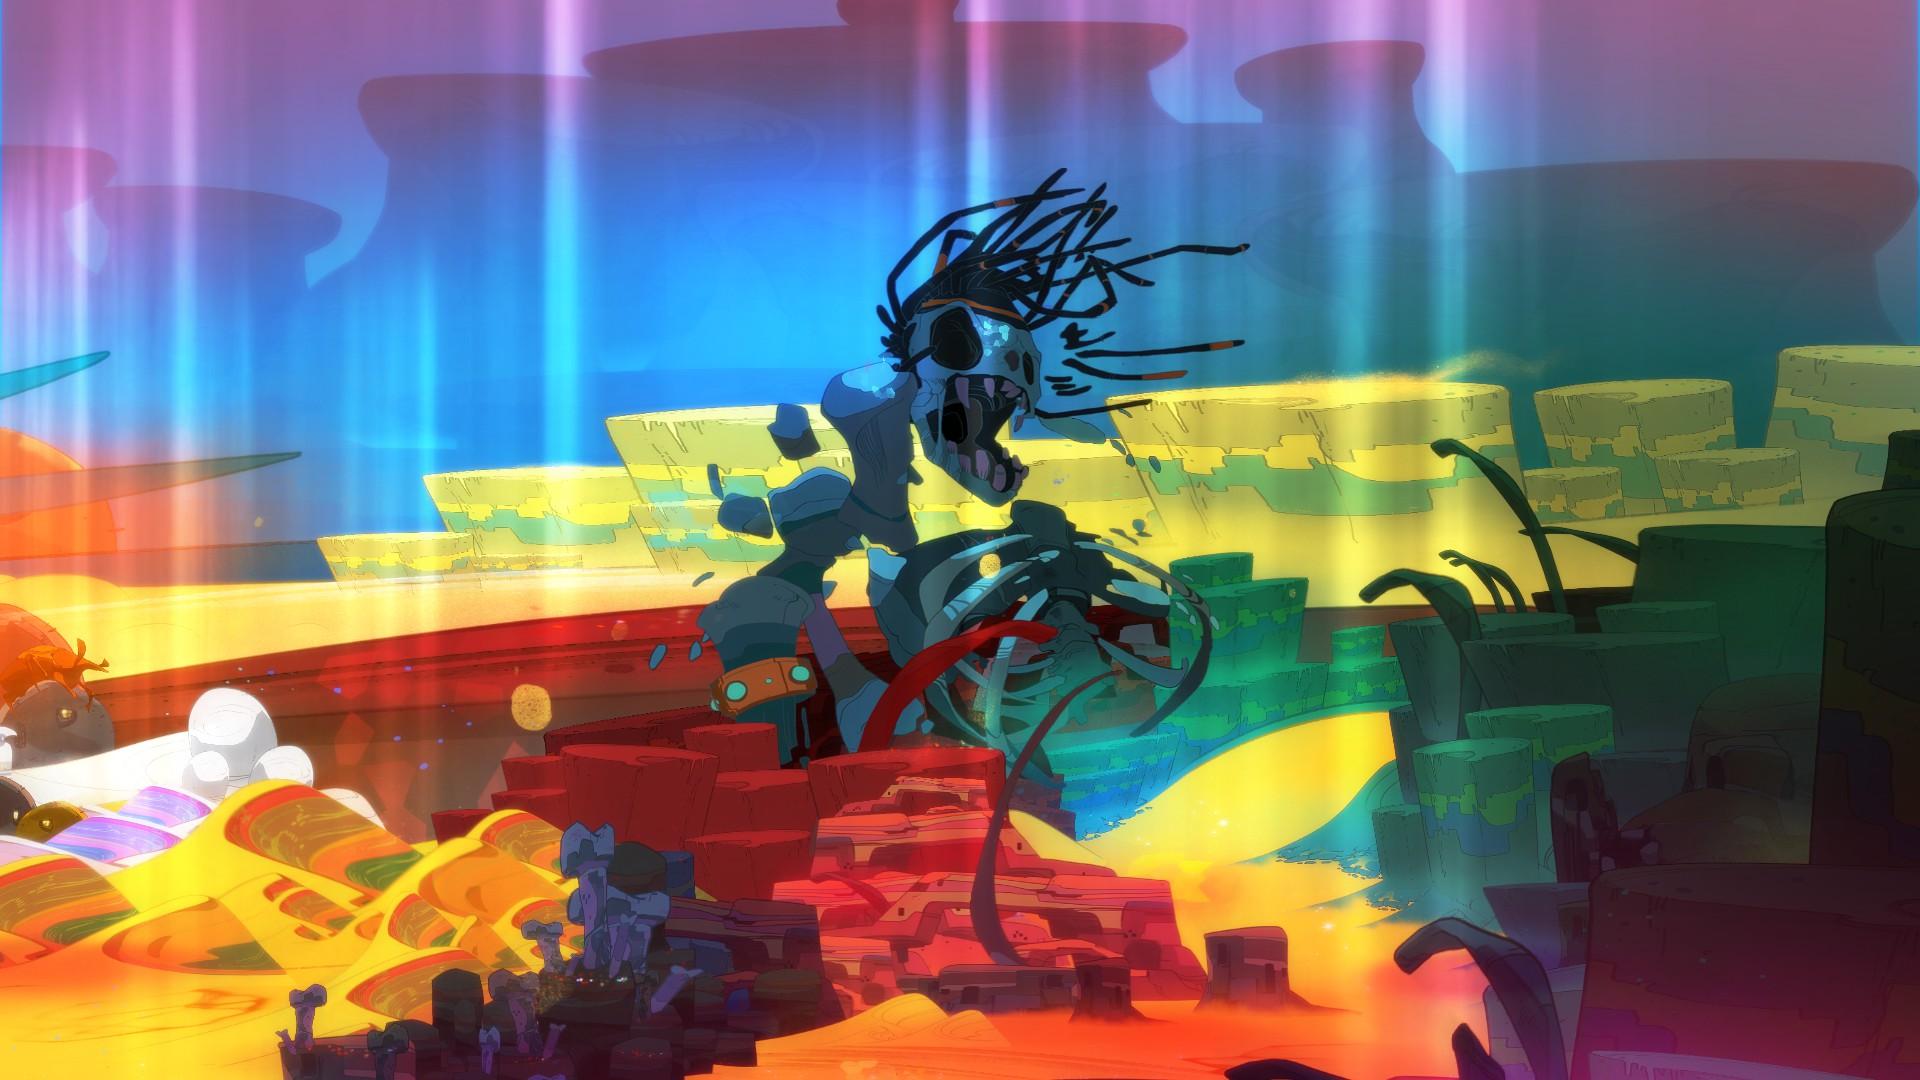 Wallpaper : Pyre, Supergiant Games, video games, artwork